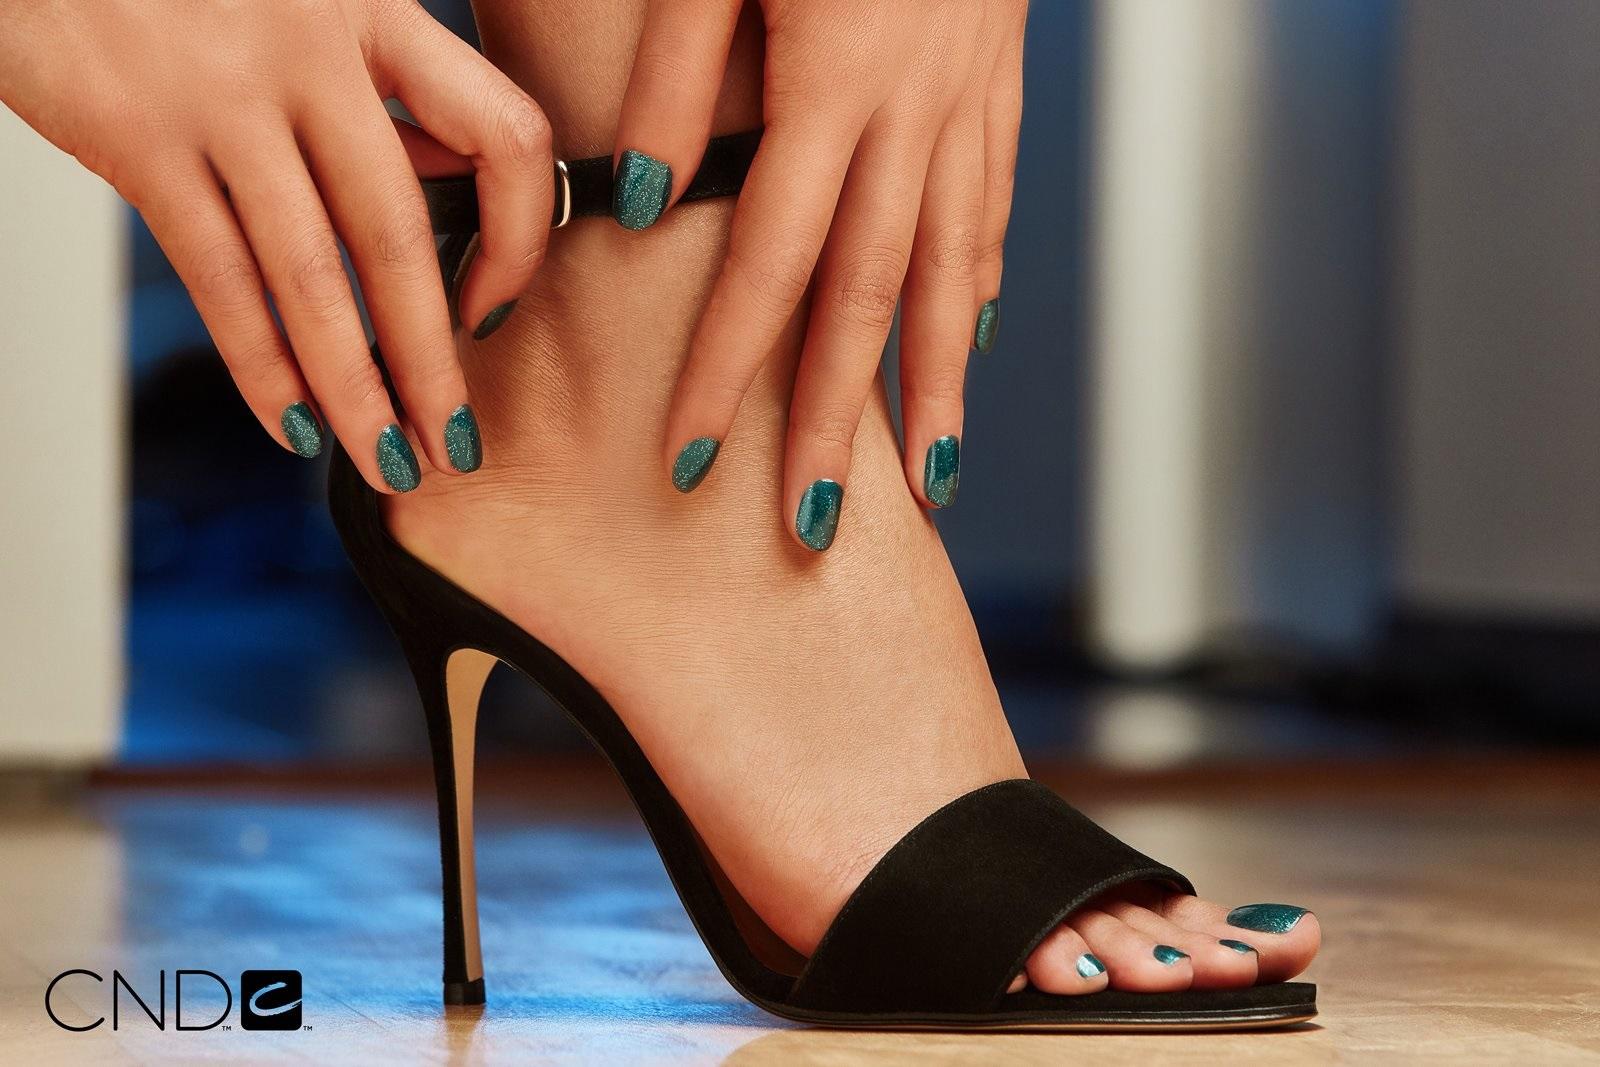 Shellac nails, edinburgh hair & beauty salons